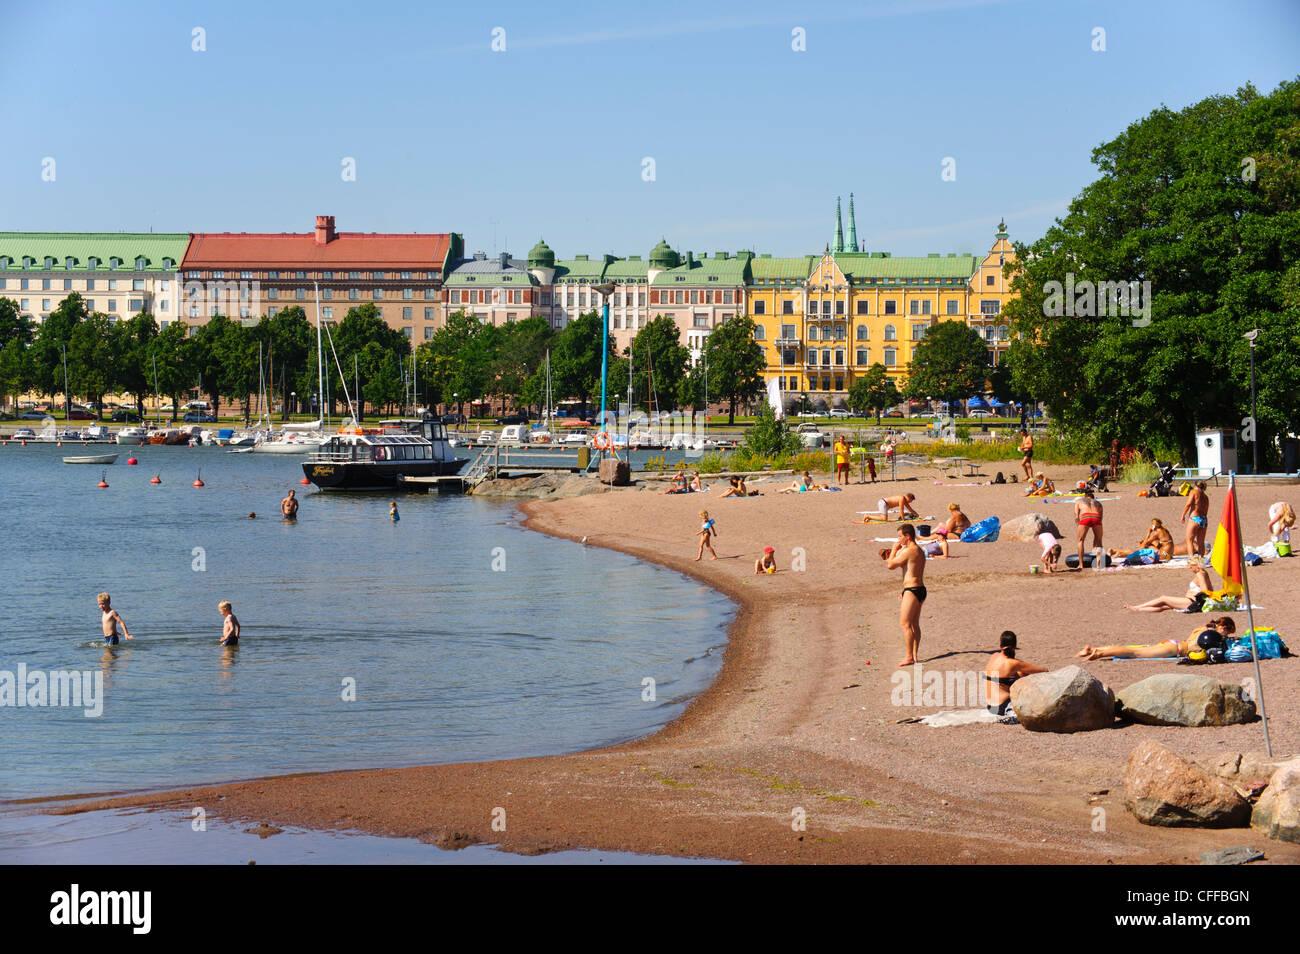 Beach on Unisaari island, looking towards the Merisatama quayside, Helsinki Finland - Stock Image